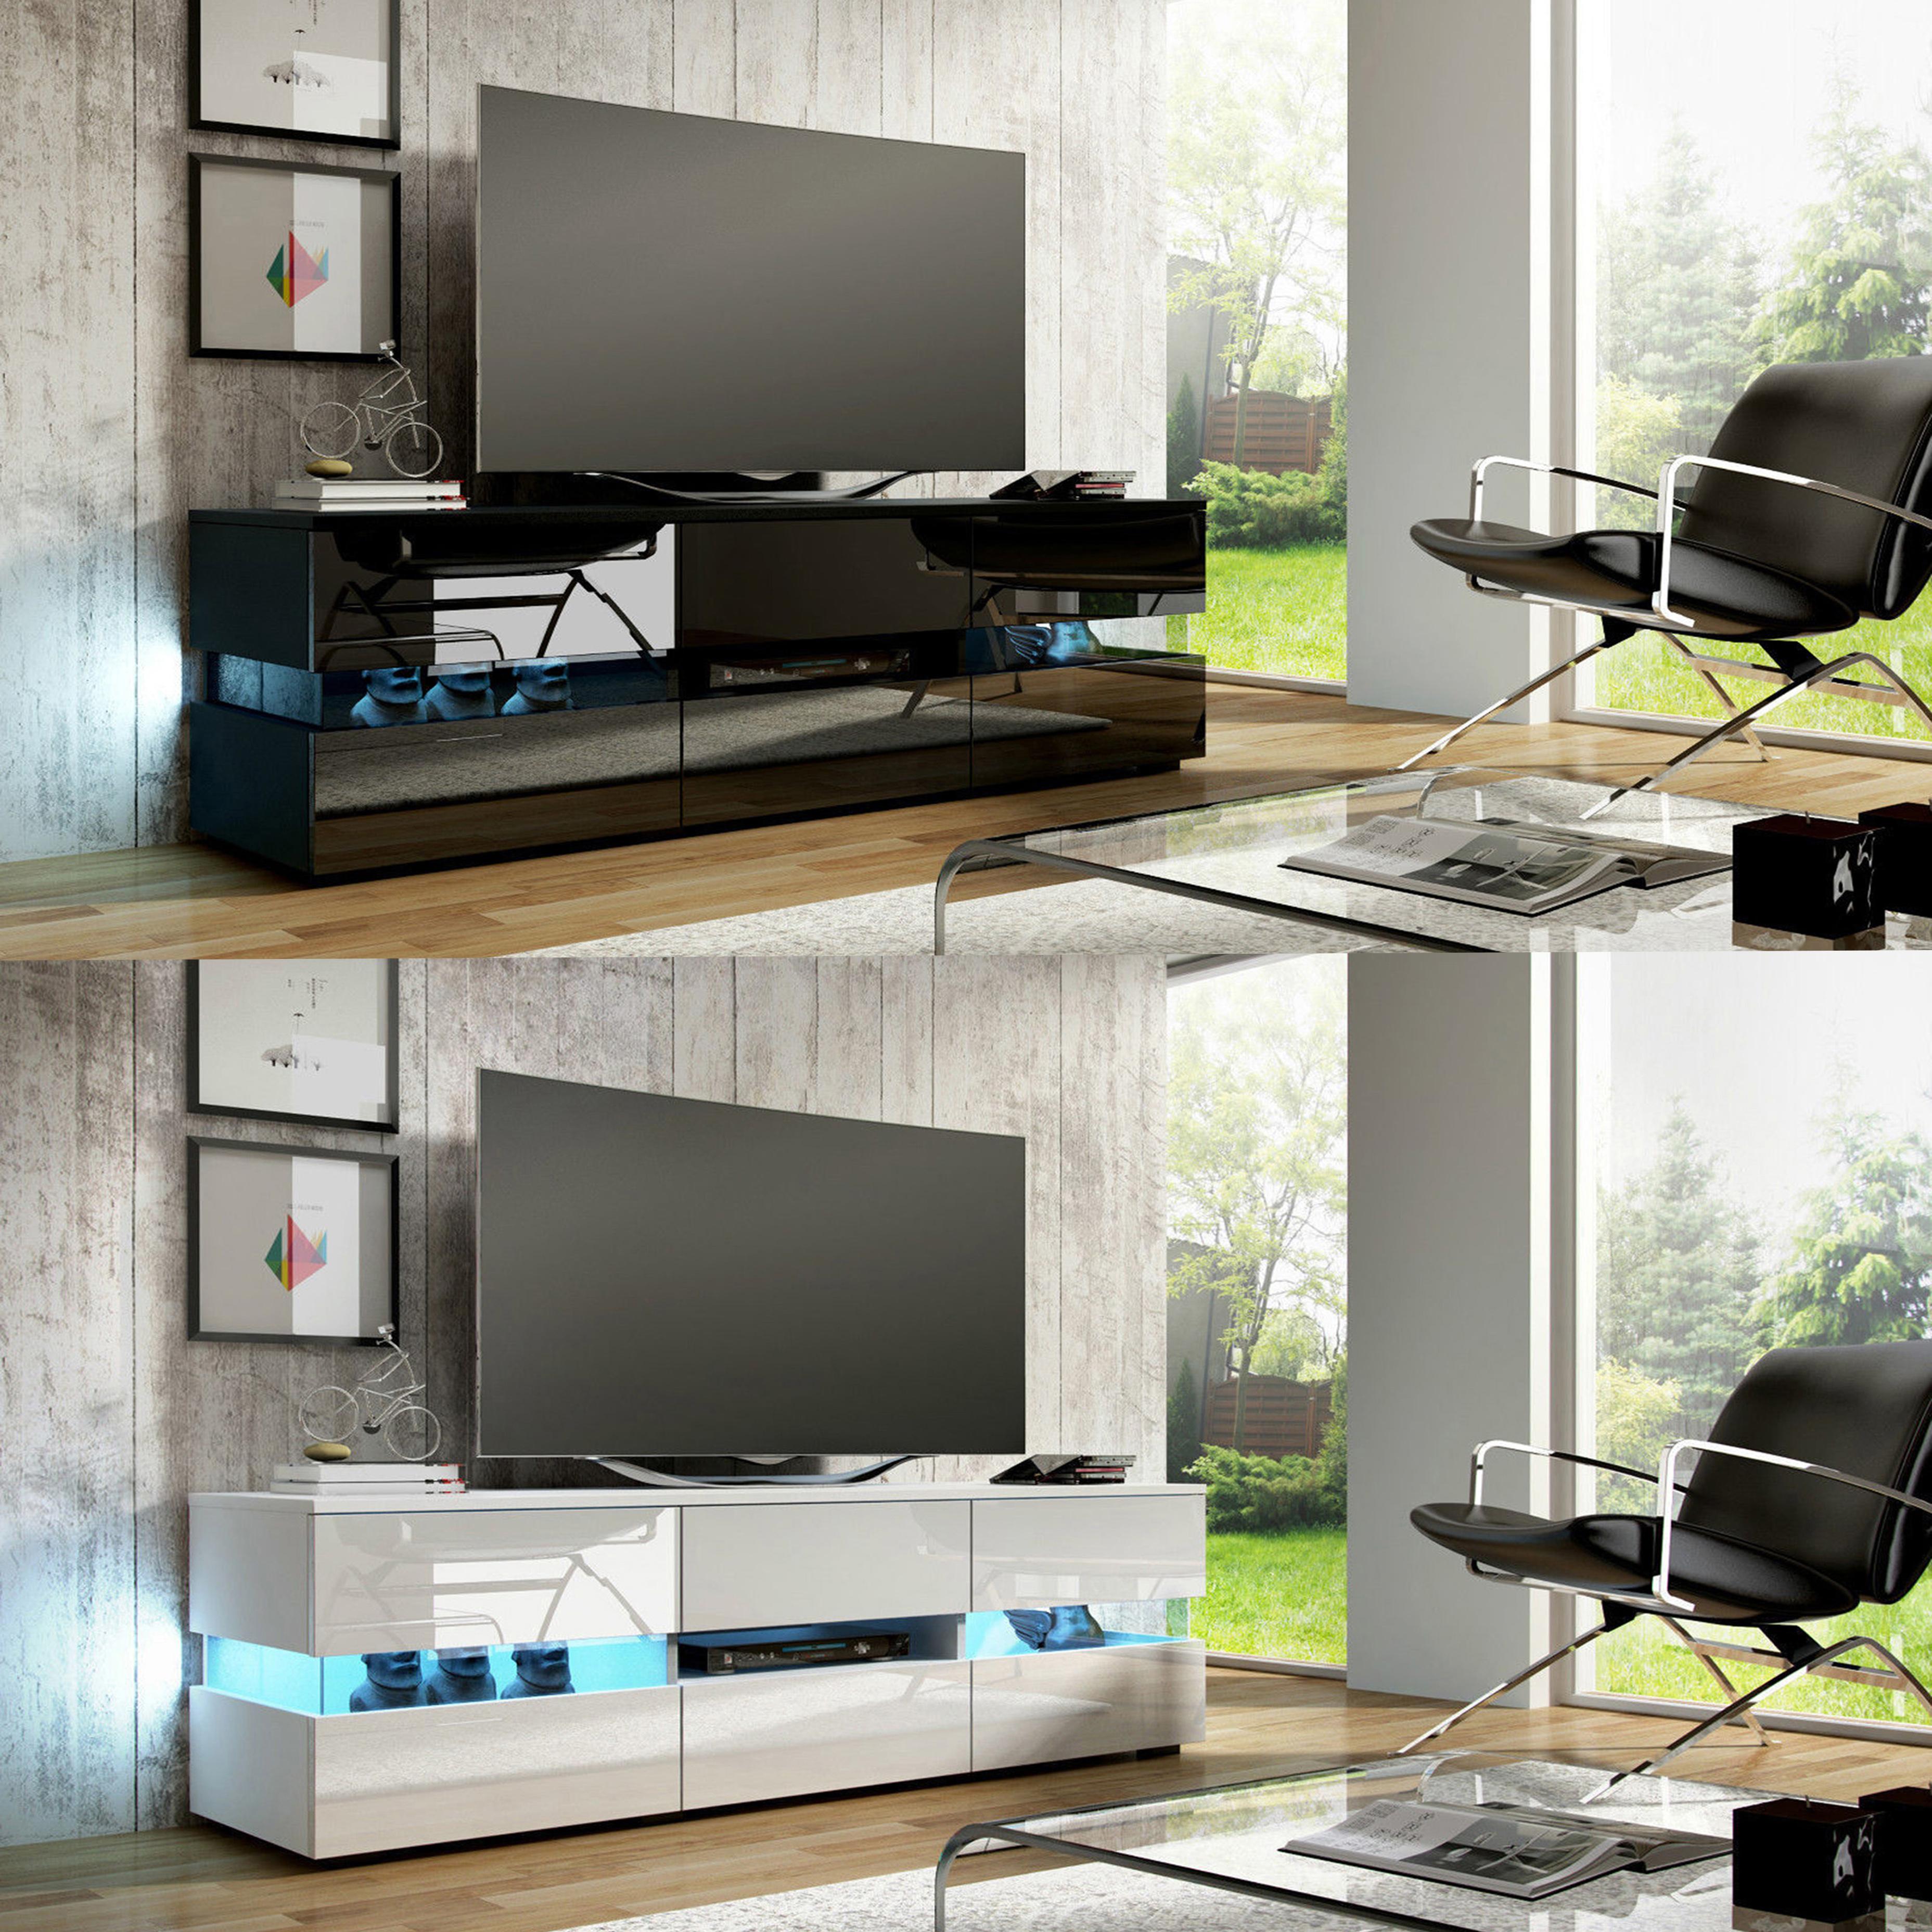 Sentinel FoxHunter High Gloss Matt TV Cabinet Unit Stand RGB LED Light Home  TVC07 177cm Part 81